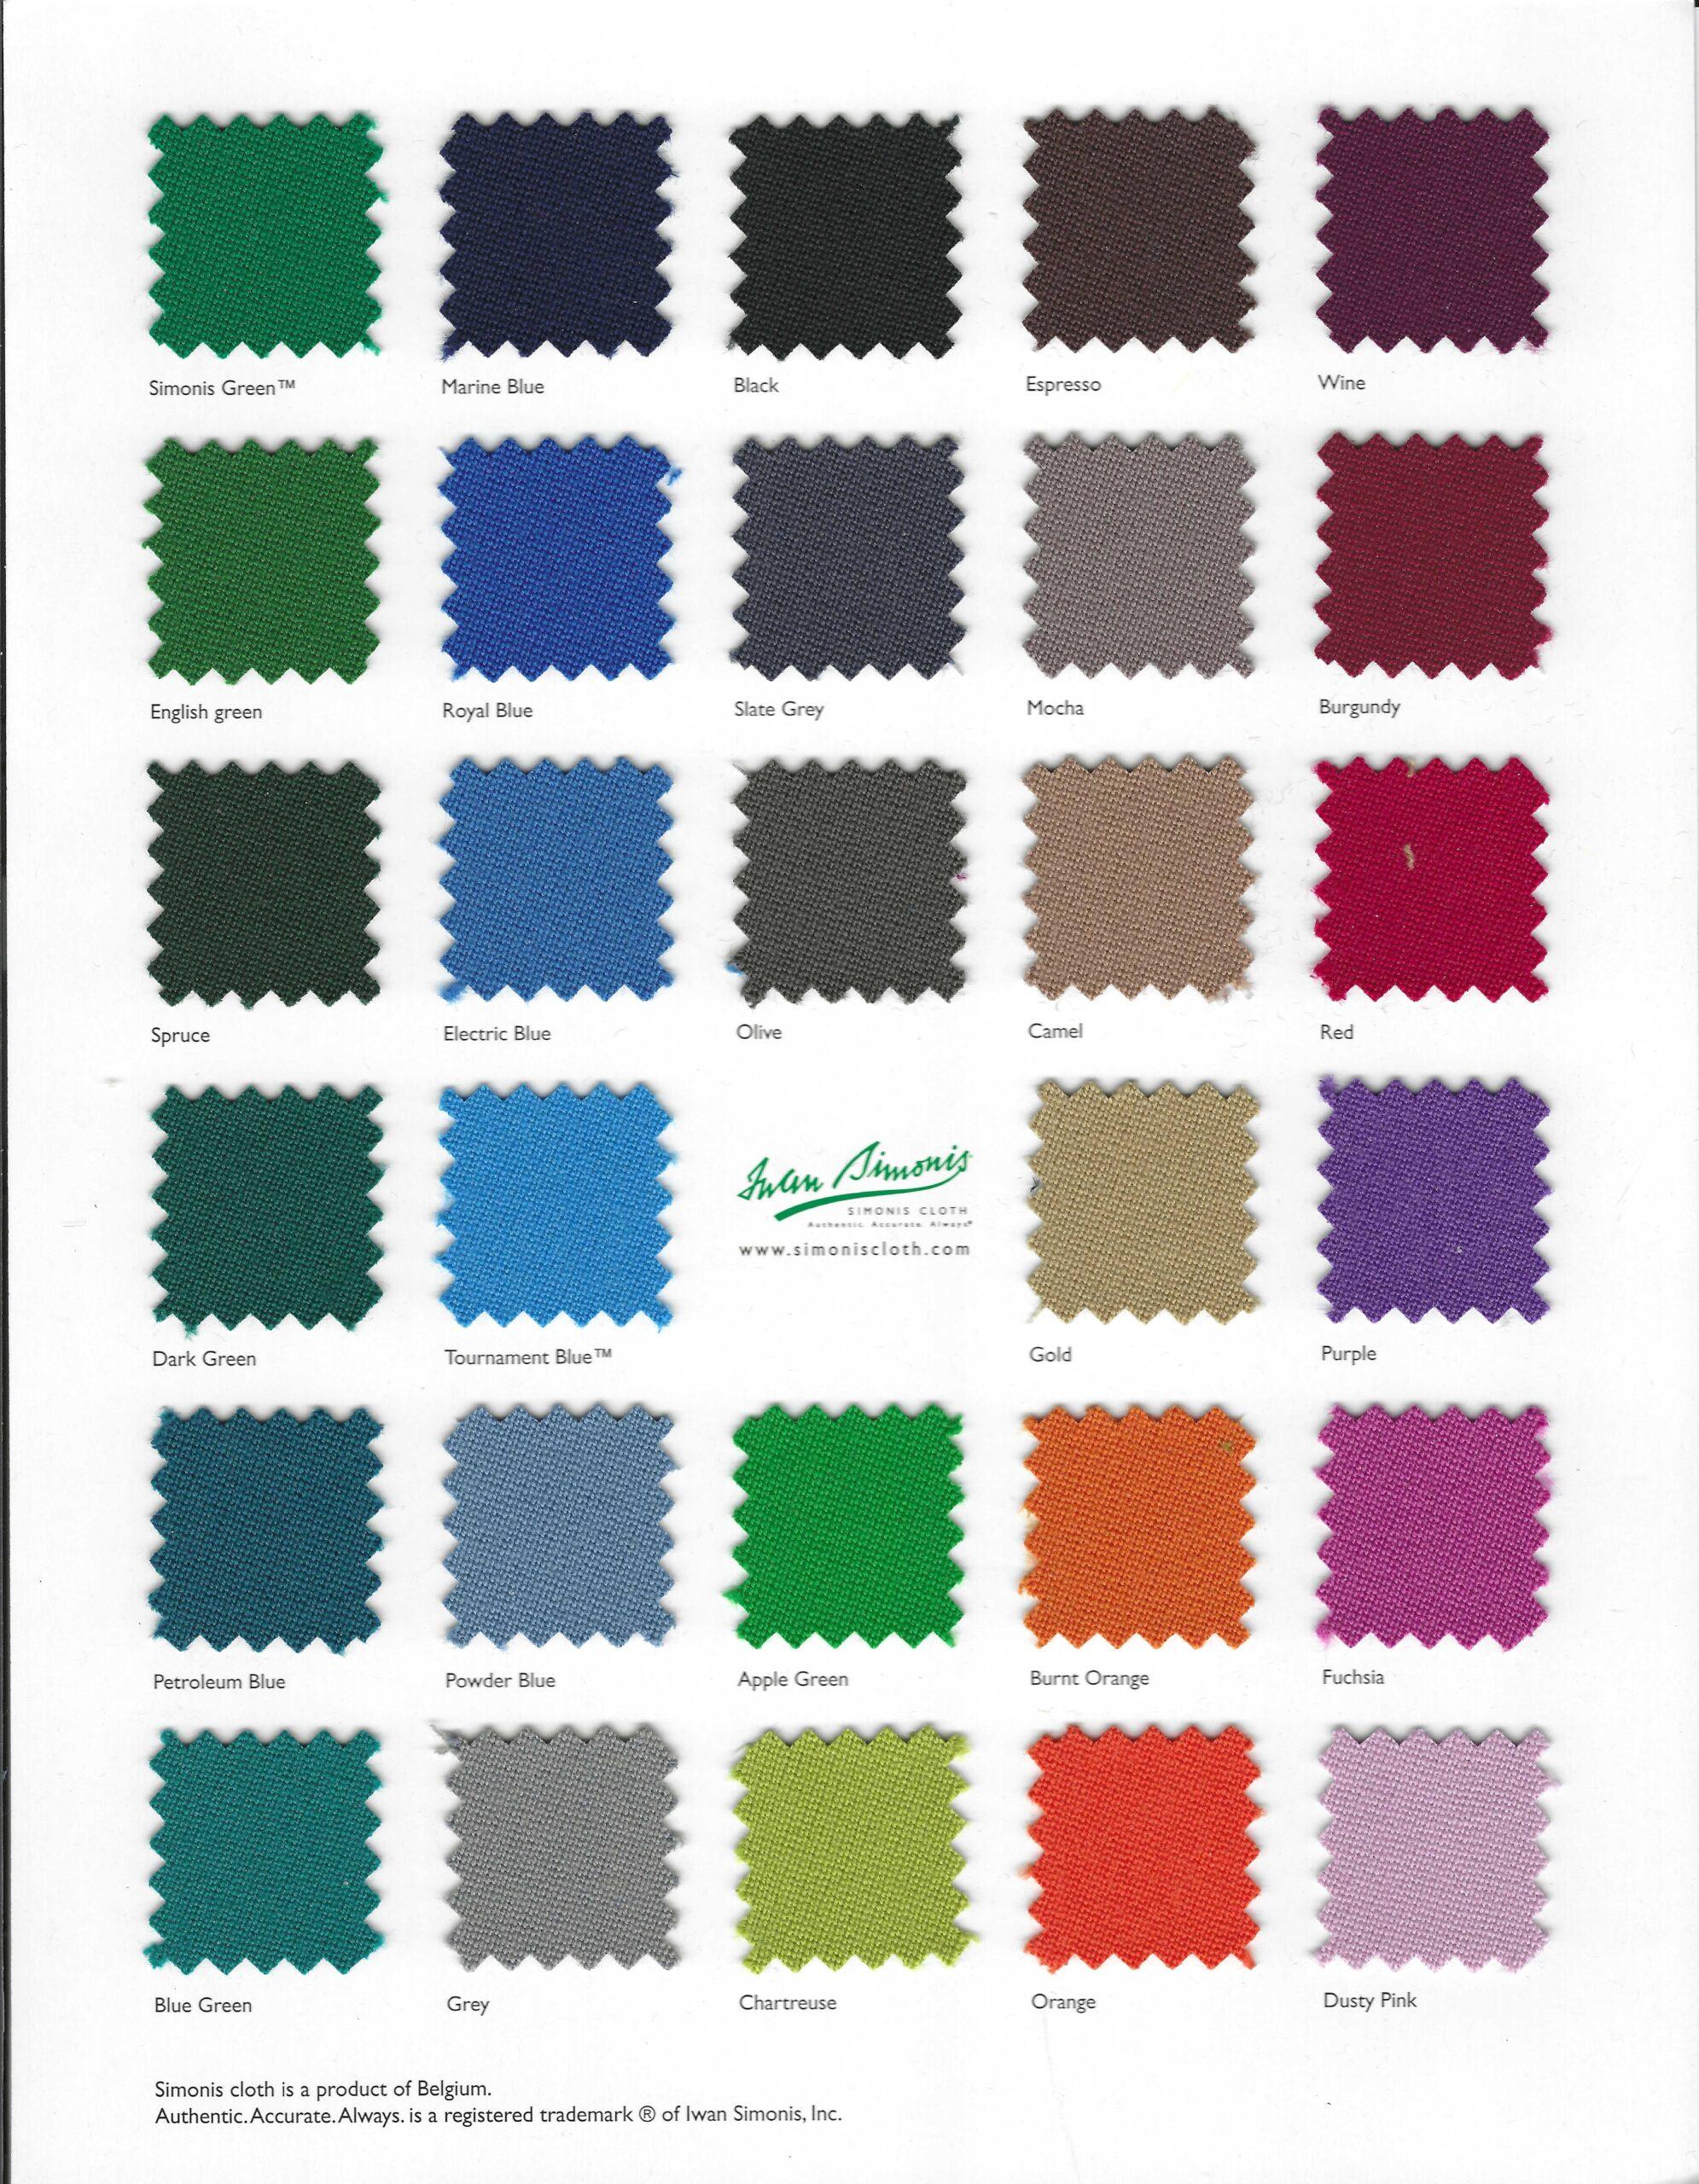 NEW Simonis Cloth Colors